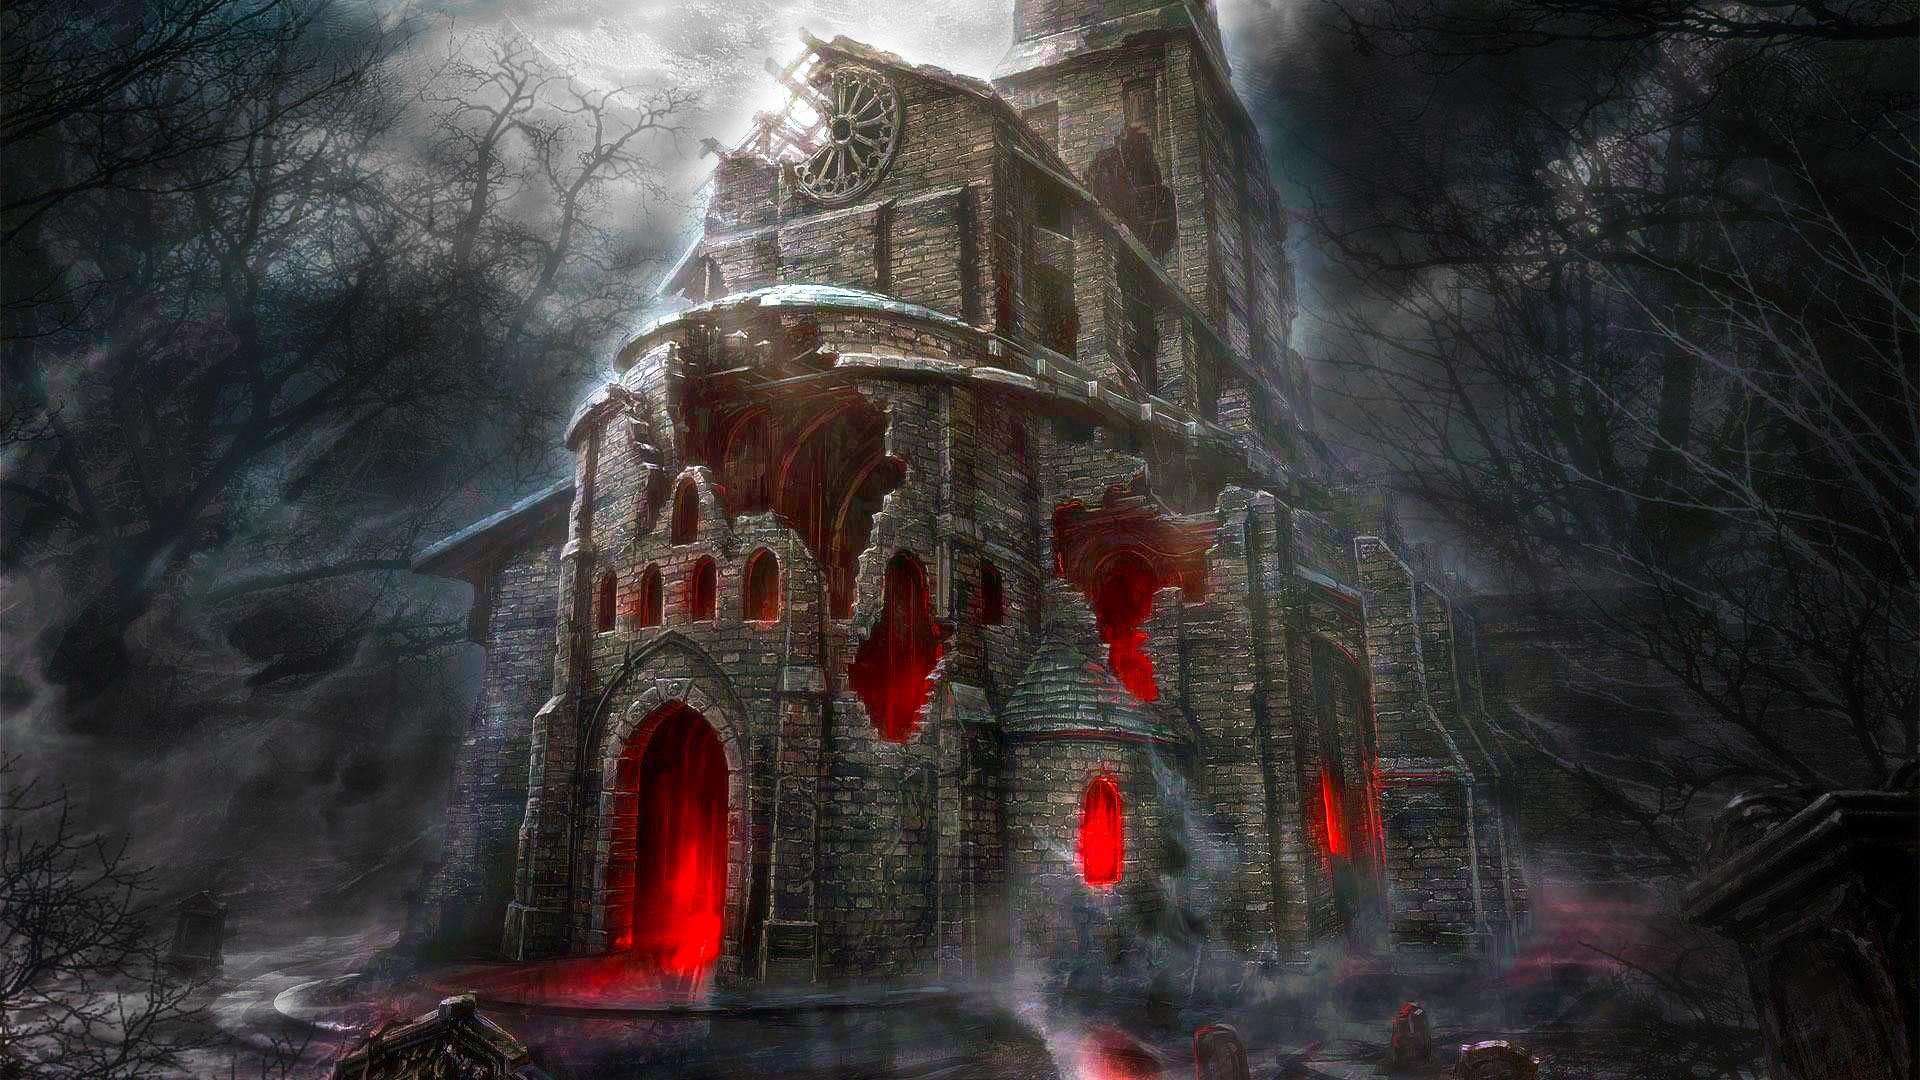 Halloween Horror HD Wallpapers | HD Wallpapers | Pinterest | Hd wallpaper,  Wallpaper and Monsters